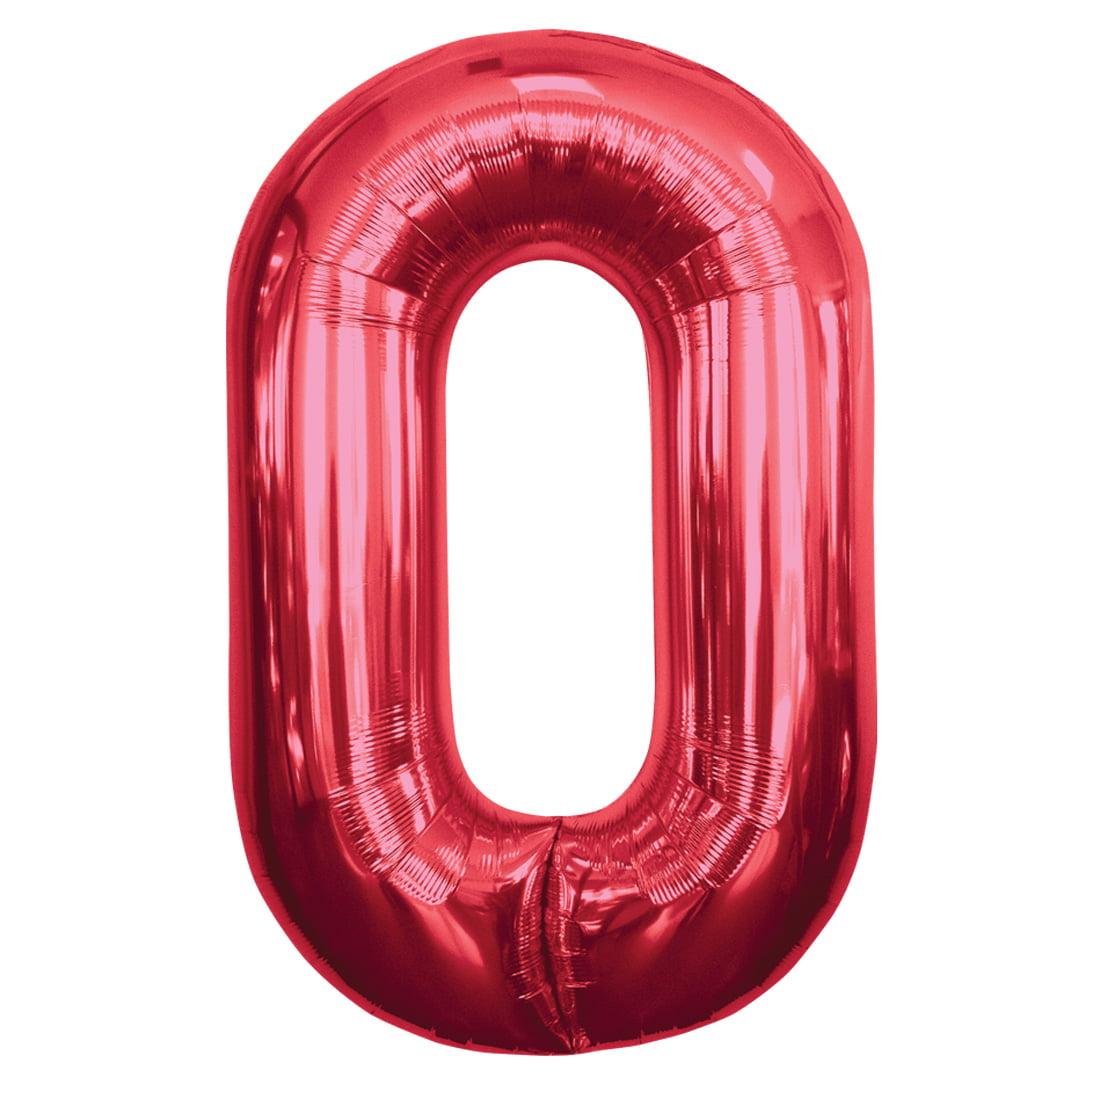 "Northstar Number 0 Zero Shape Solid Jumbo Helium 34"" Foil Balloon, Red"